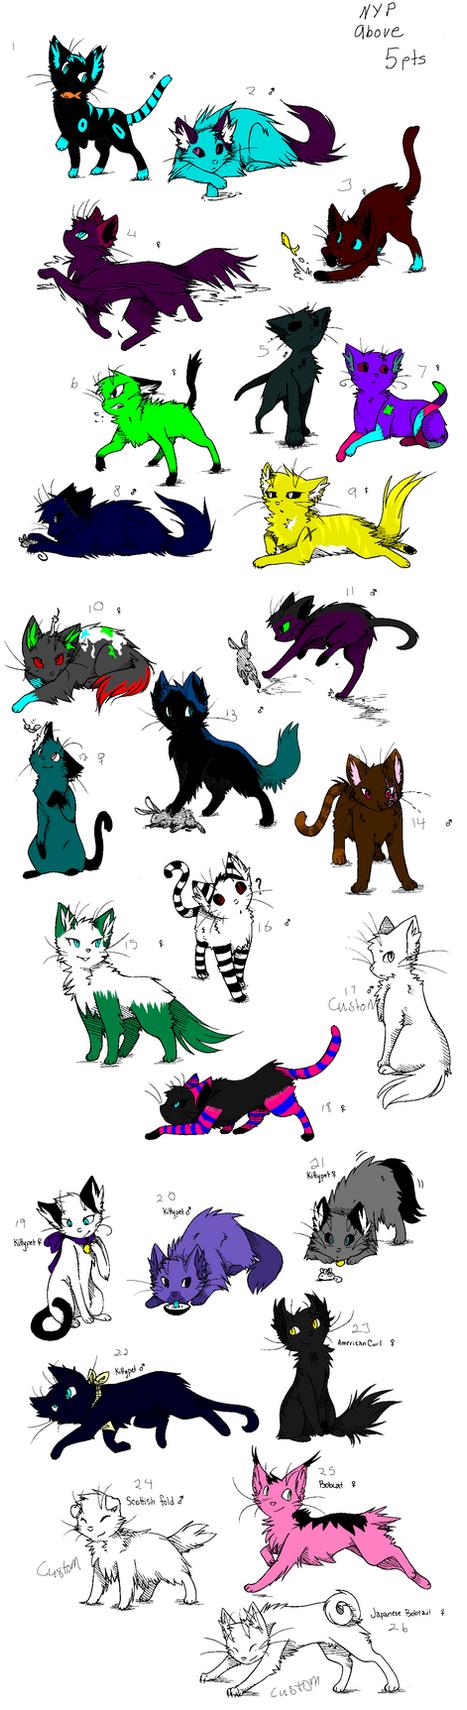 26 Cat Adopts Nyp  open by InsanityArtist95